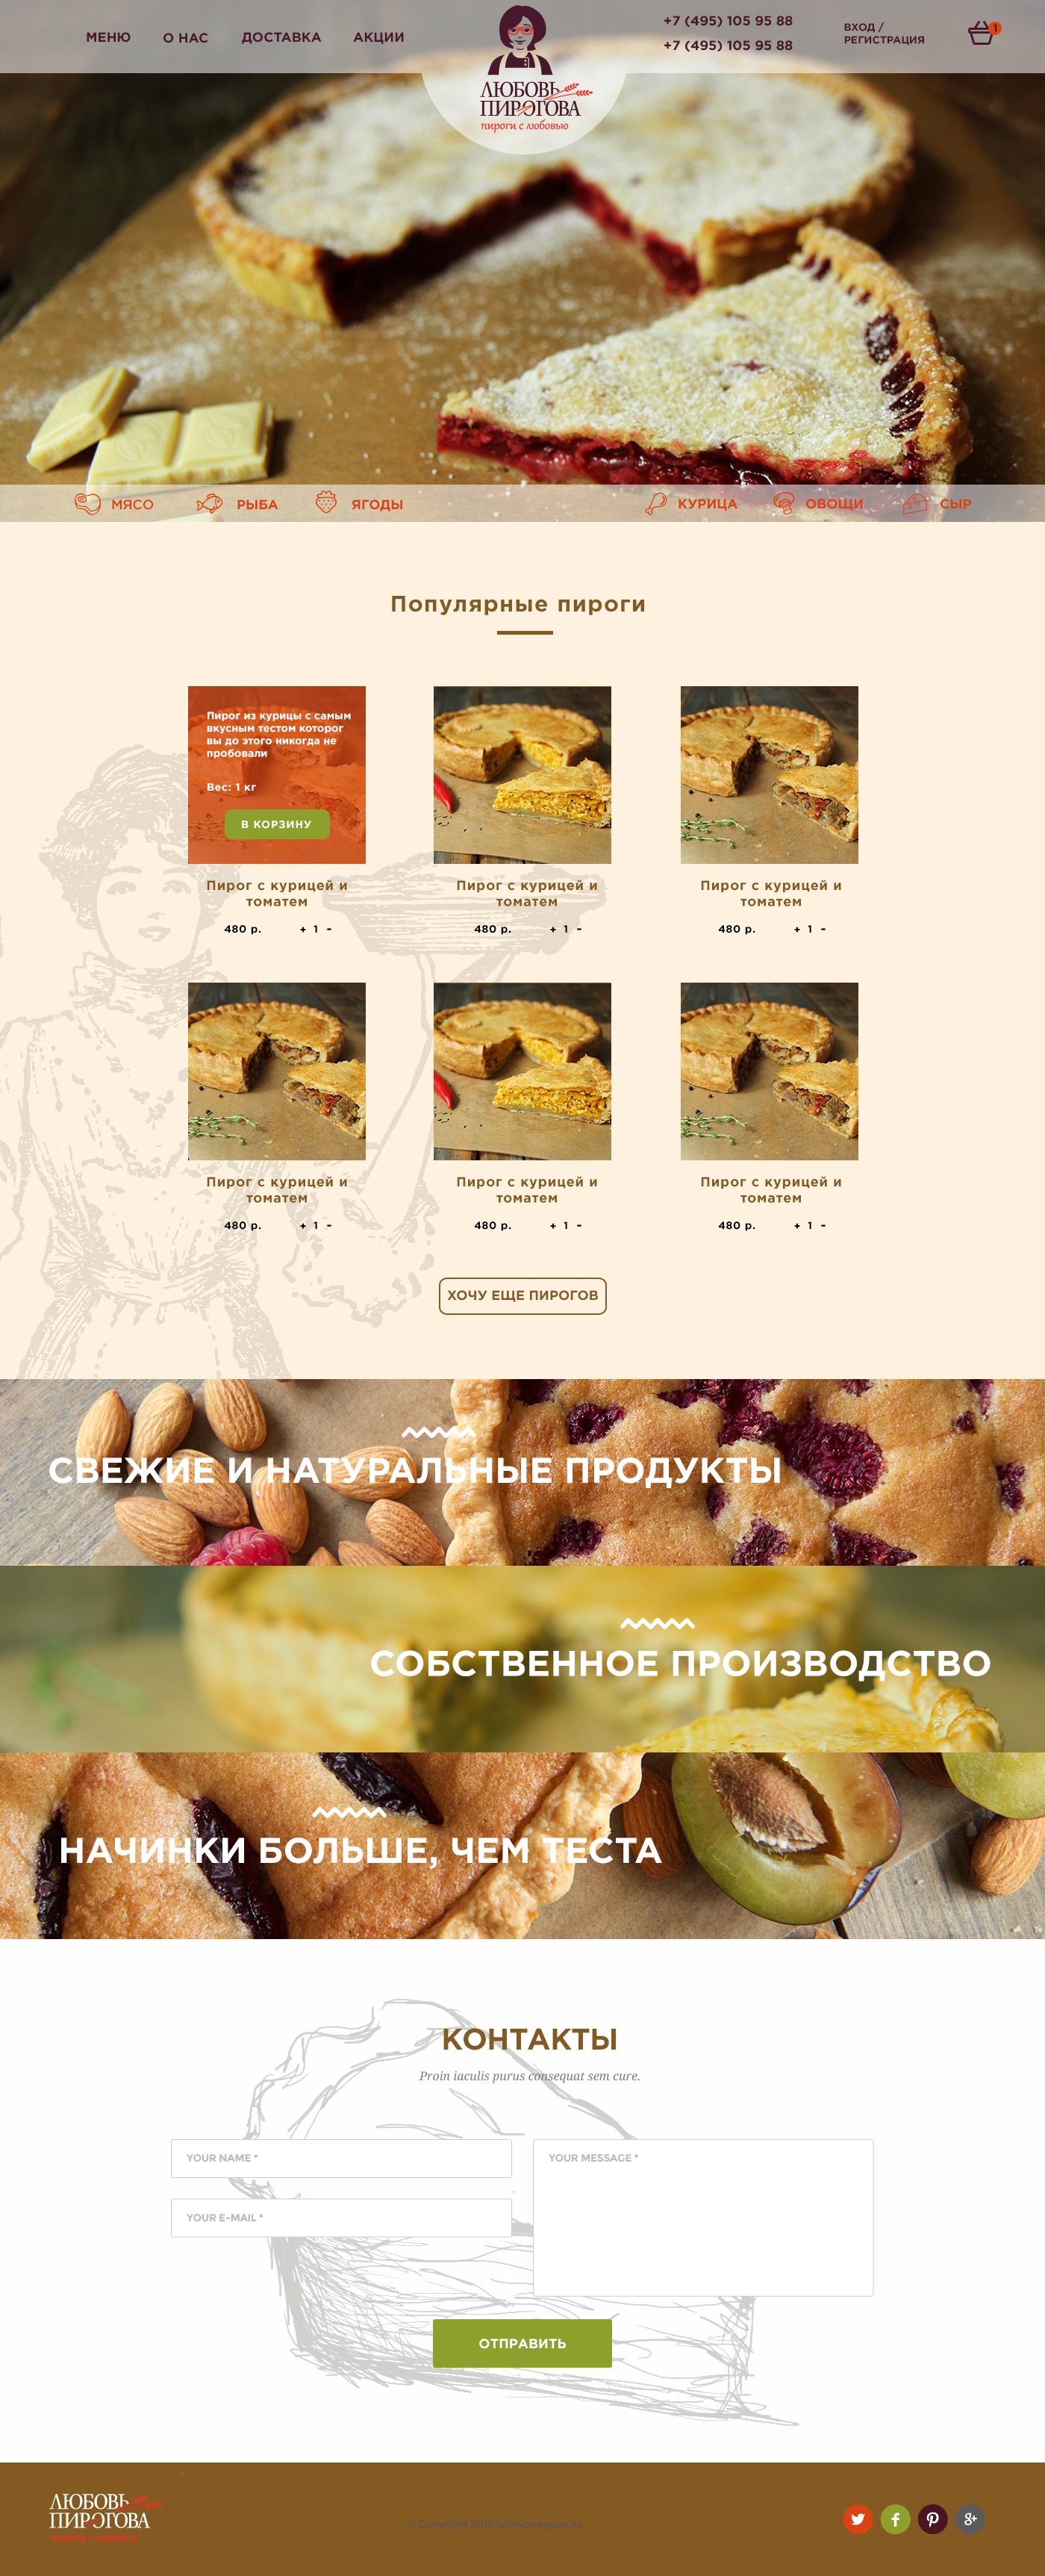 Разработка дизайна сайта lovepirogova.ru фото f_46156b5431997a84.jpg